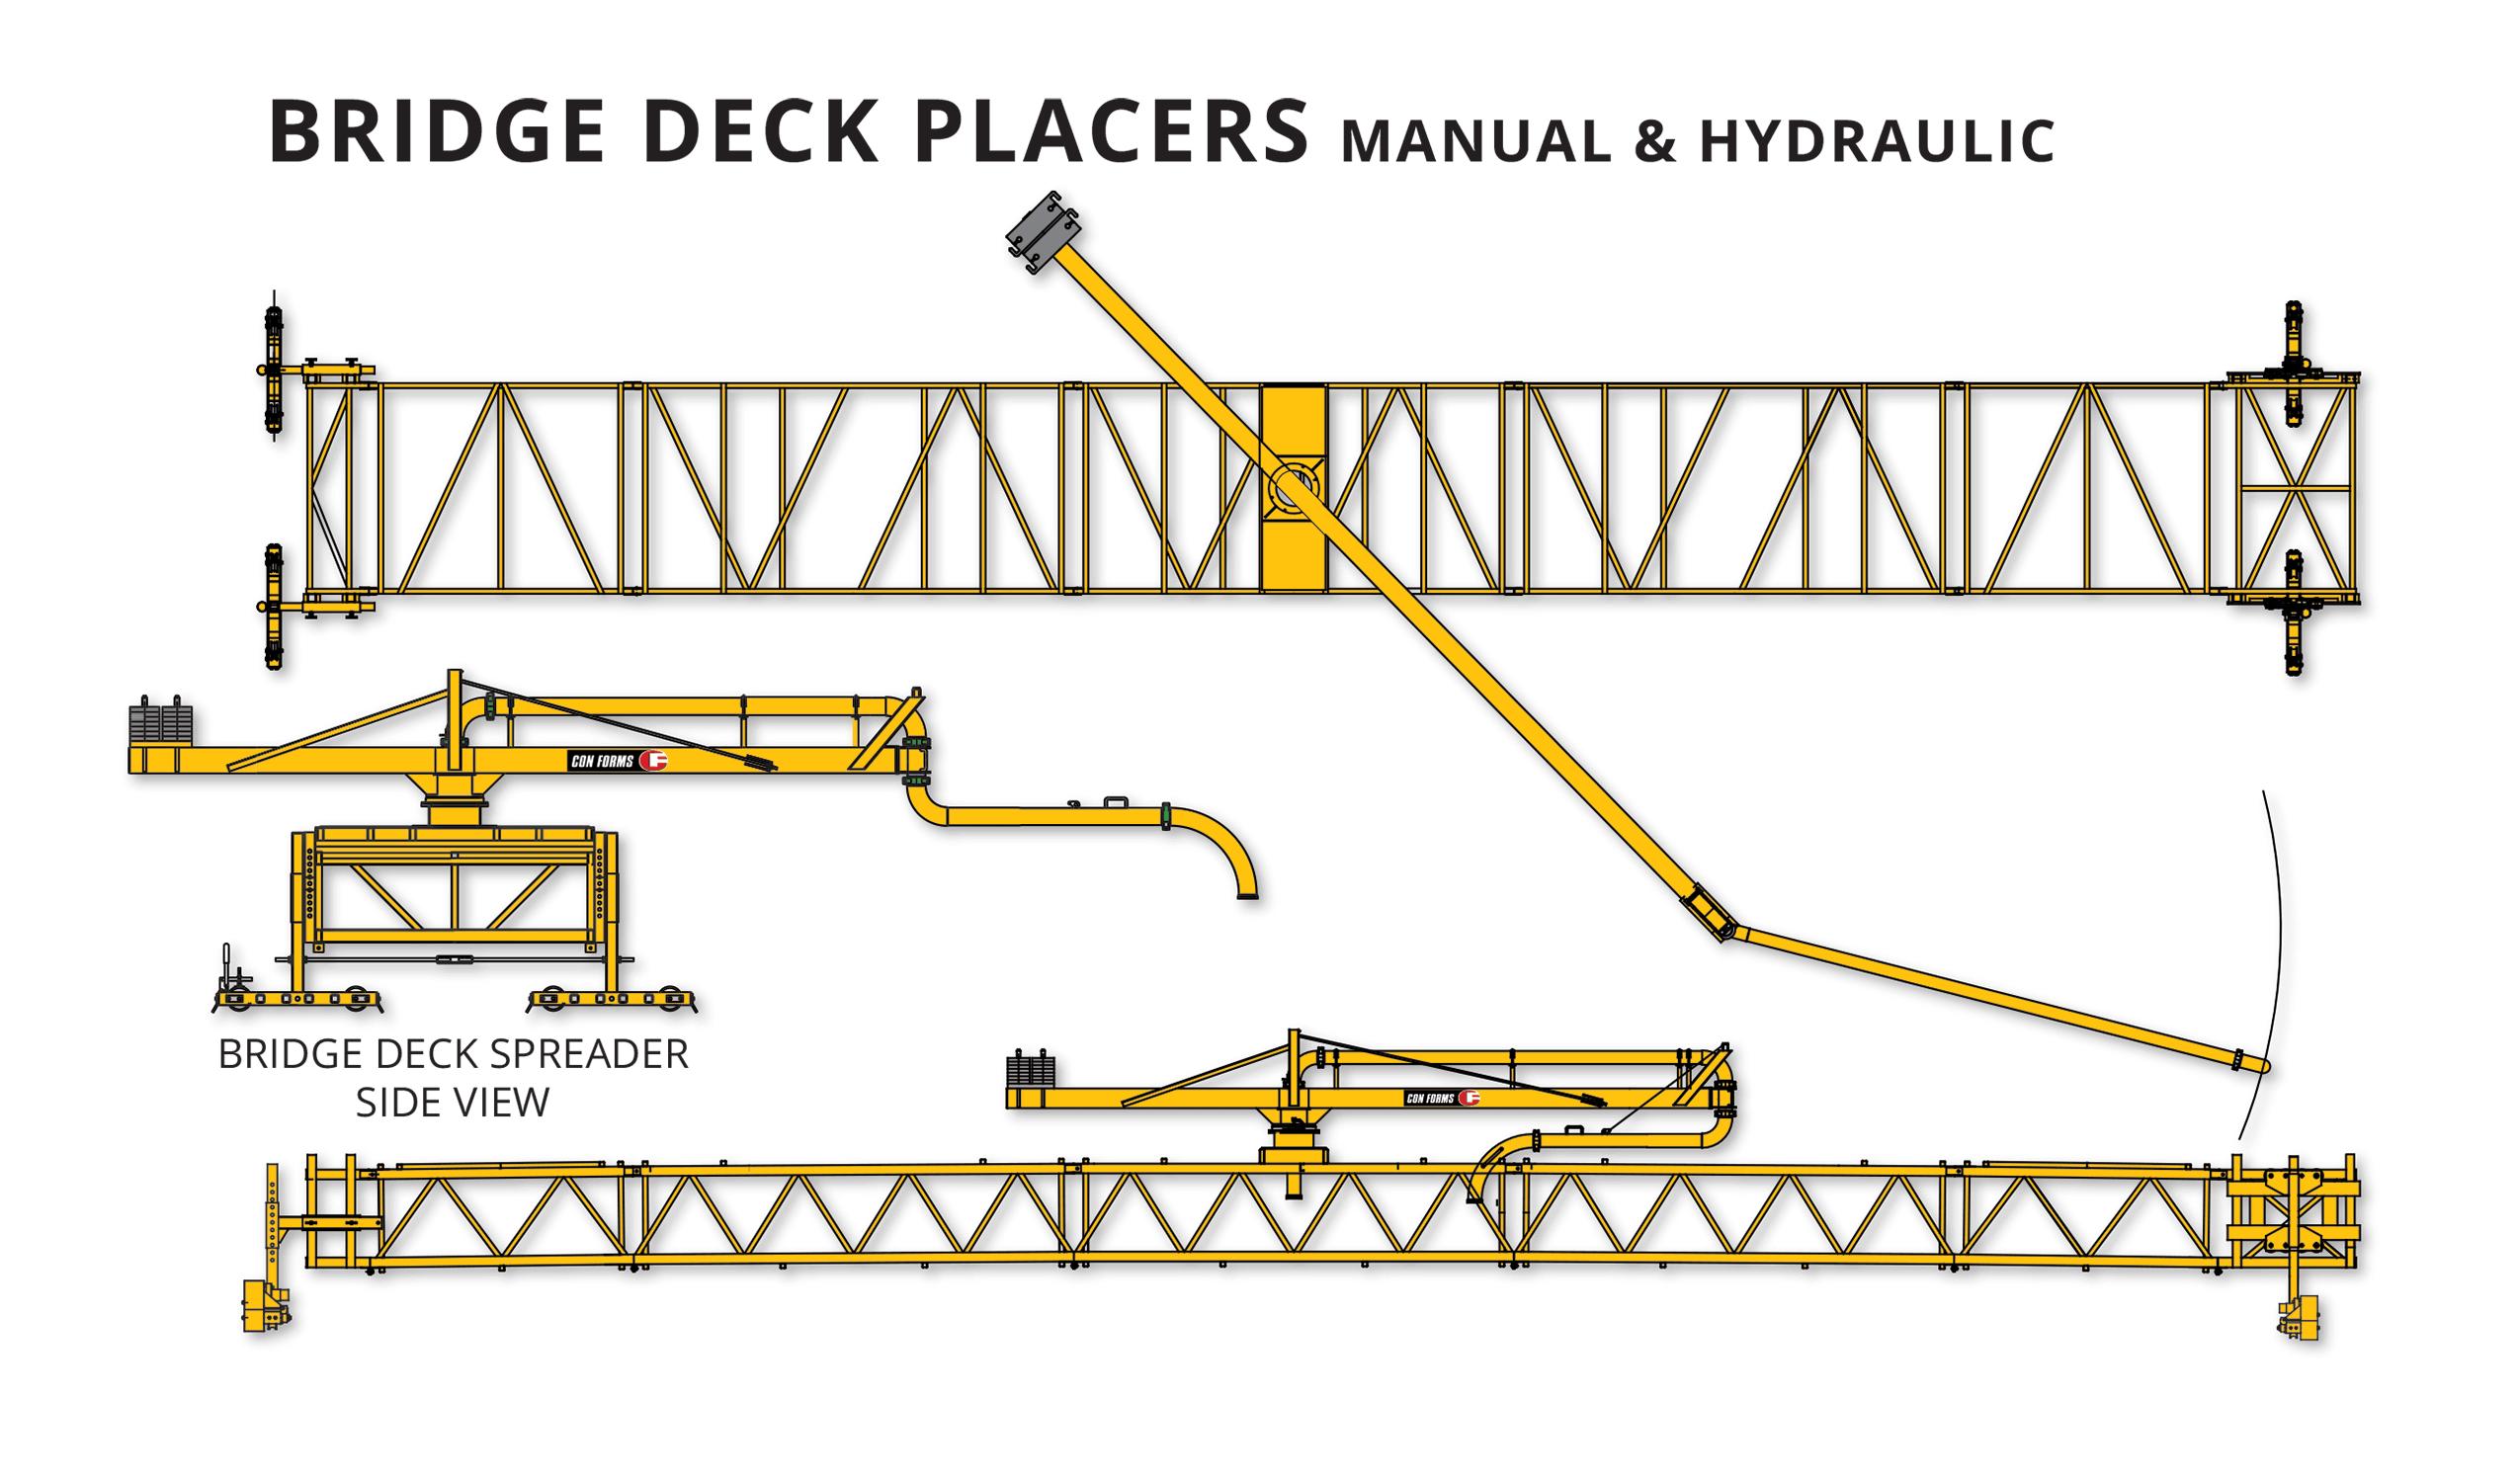 deck manual at 2206 Range Rover Sport Logic 7 Wiring Diagram